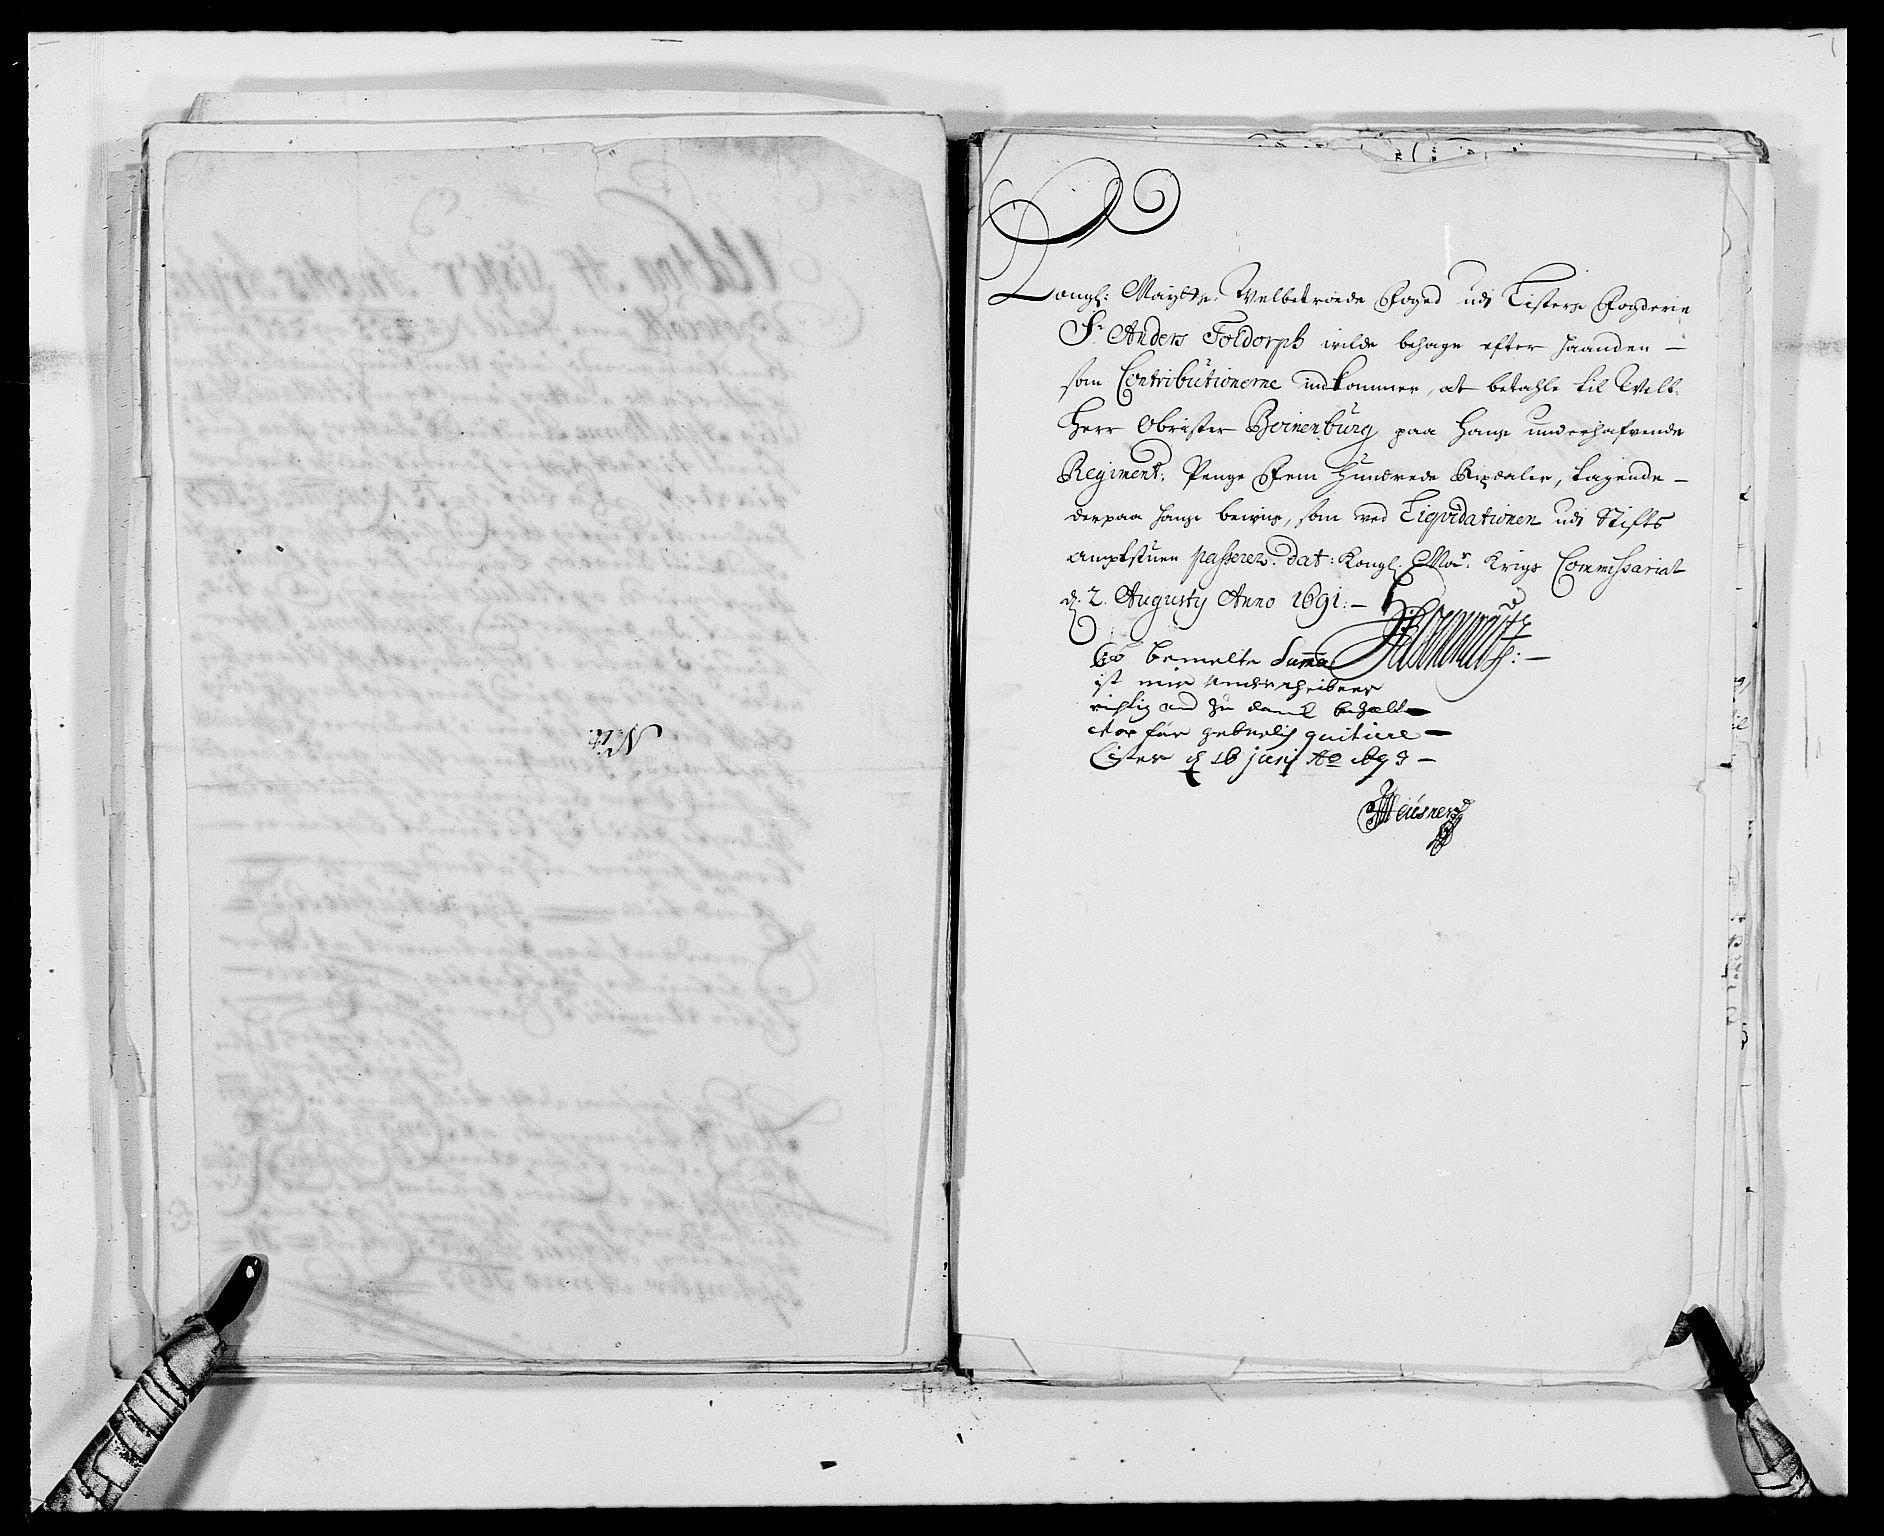 RA, Rentekammeret inntil 1814, Reviderte regnskaper, Fogderegnskap, R41/L2536: Fogderegnskap Lista, 1690-1693, s. 231